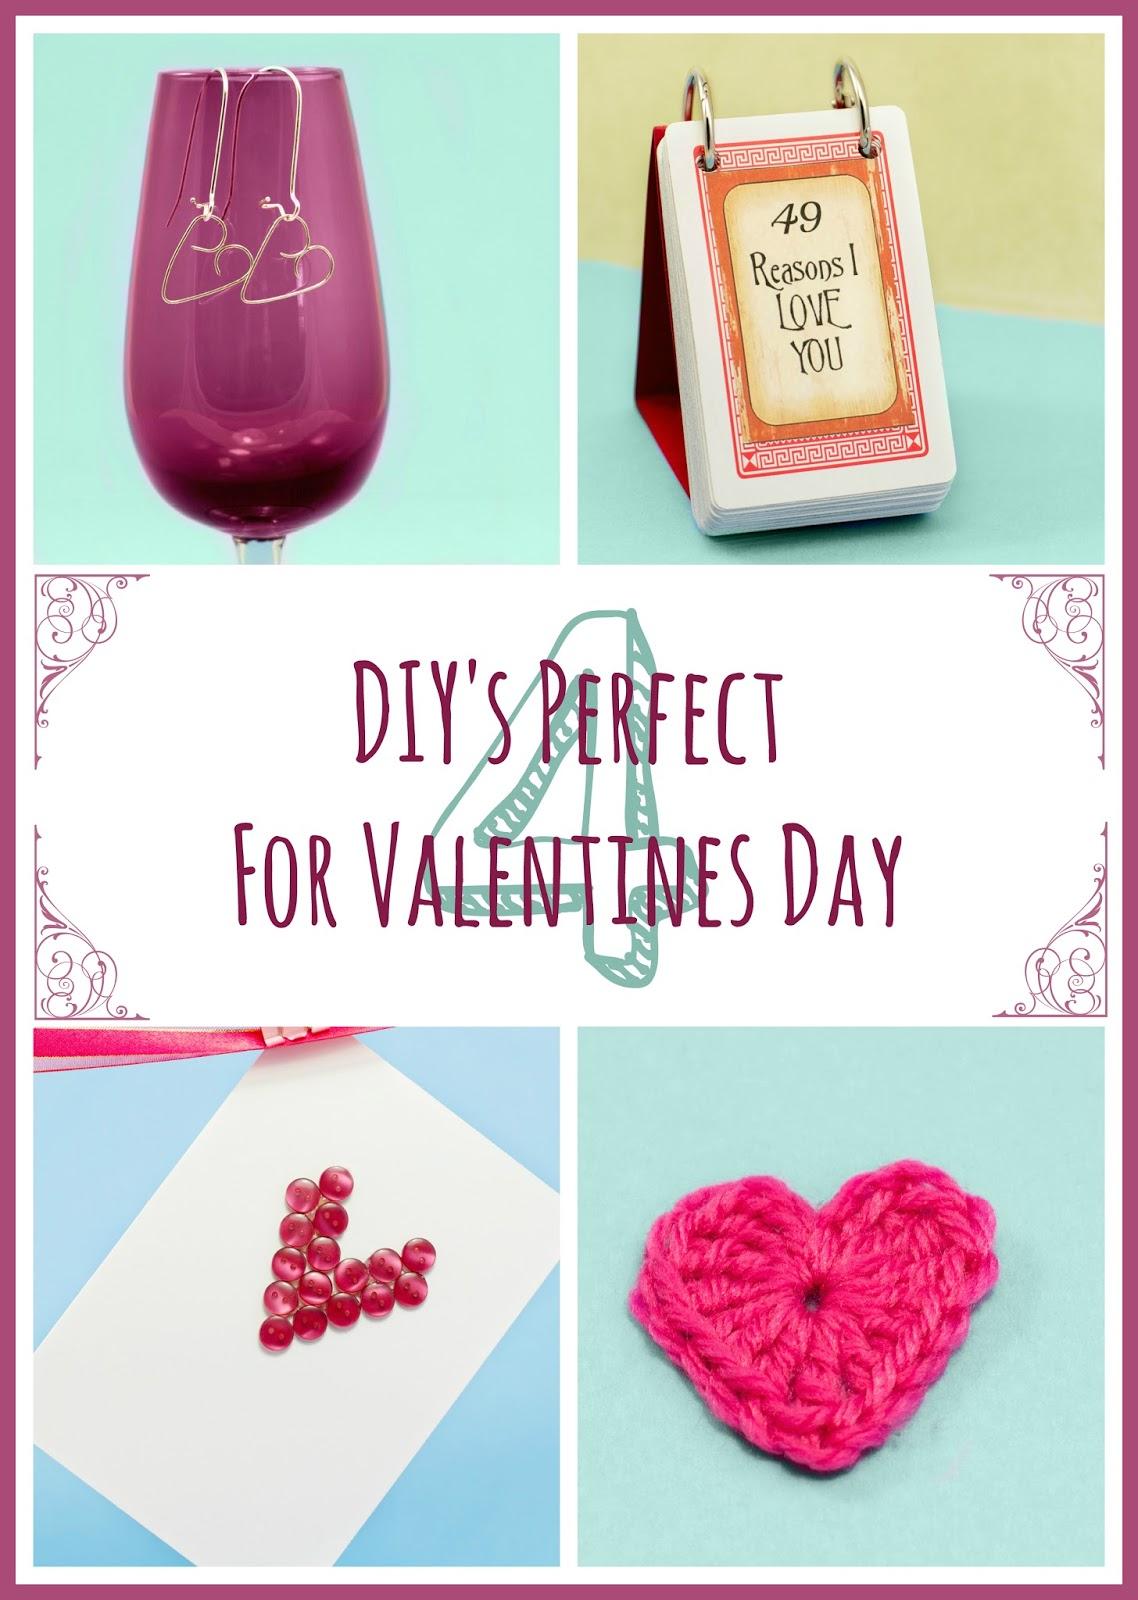 http://1.bp.blogspot.com/-9em1vlXo5r0/Uu8i49V1O9I/AAAAAAAAGsE/sBH_2qRThTk/s1600/4+DIY's+Perfect+For+Valentines+Day+1.jpg